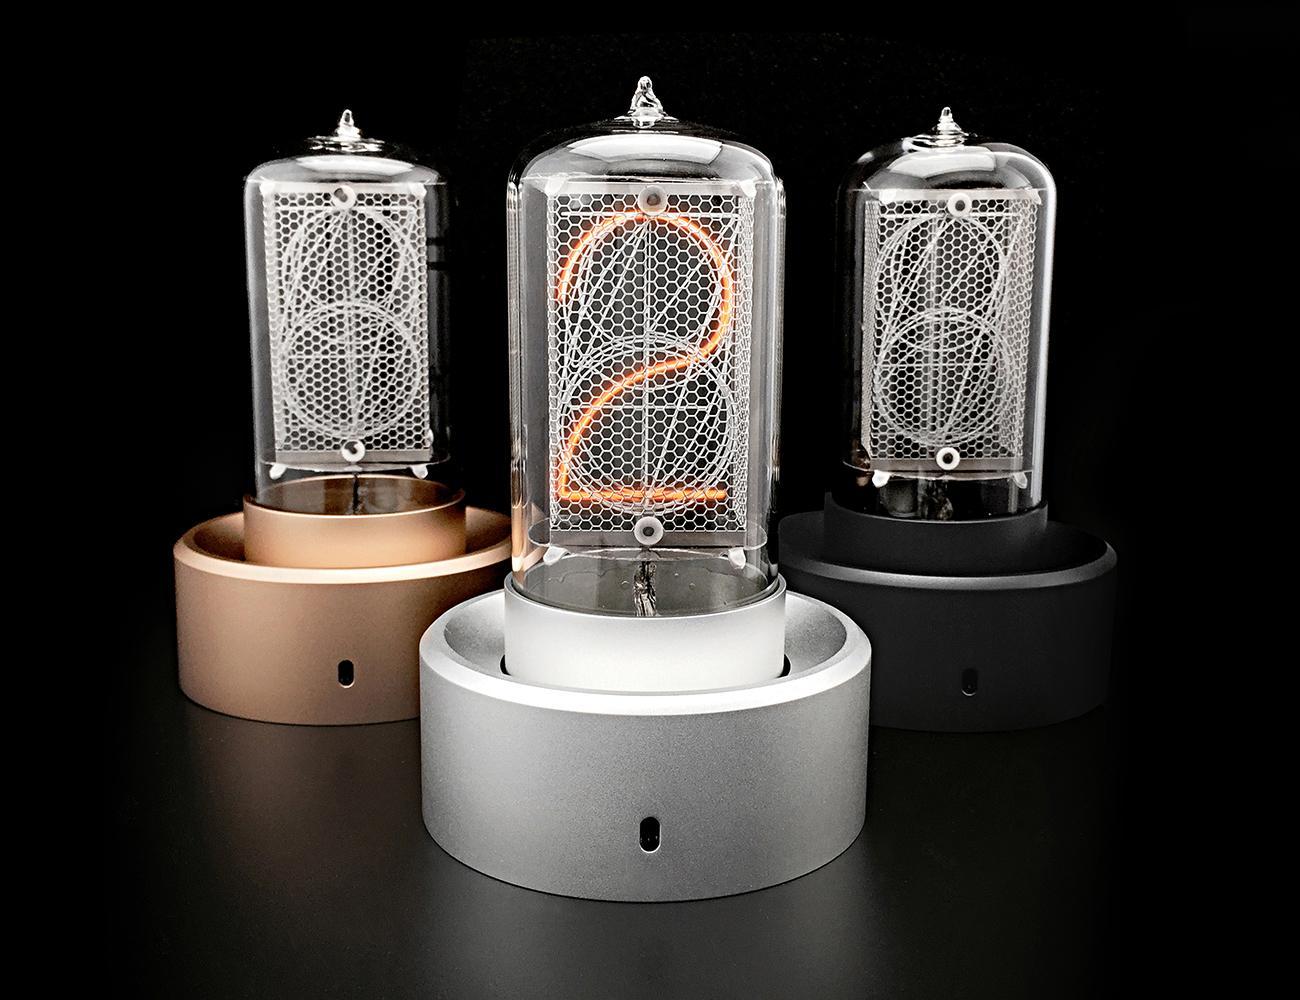 Blub Keo Nixie Tube Clock 187 Gadget Flow